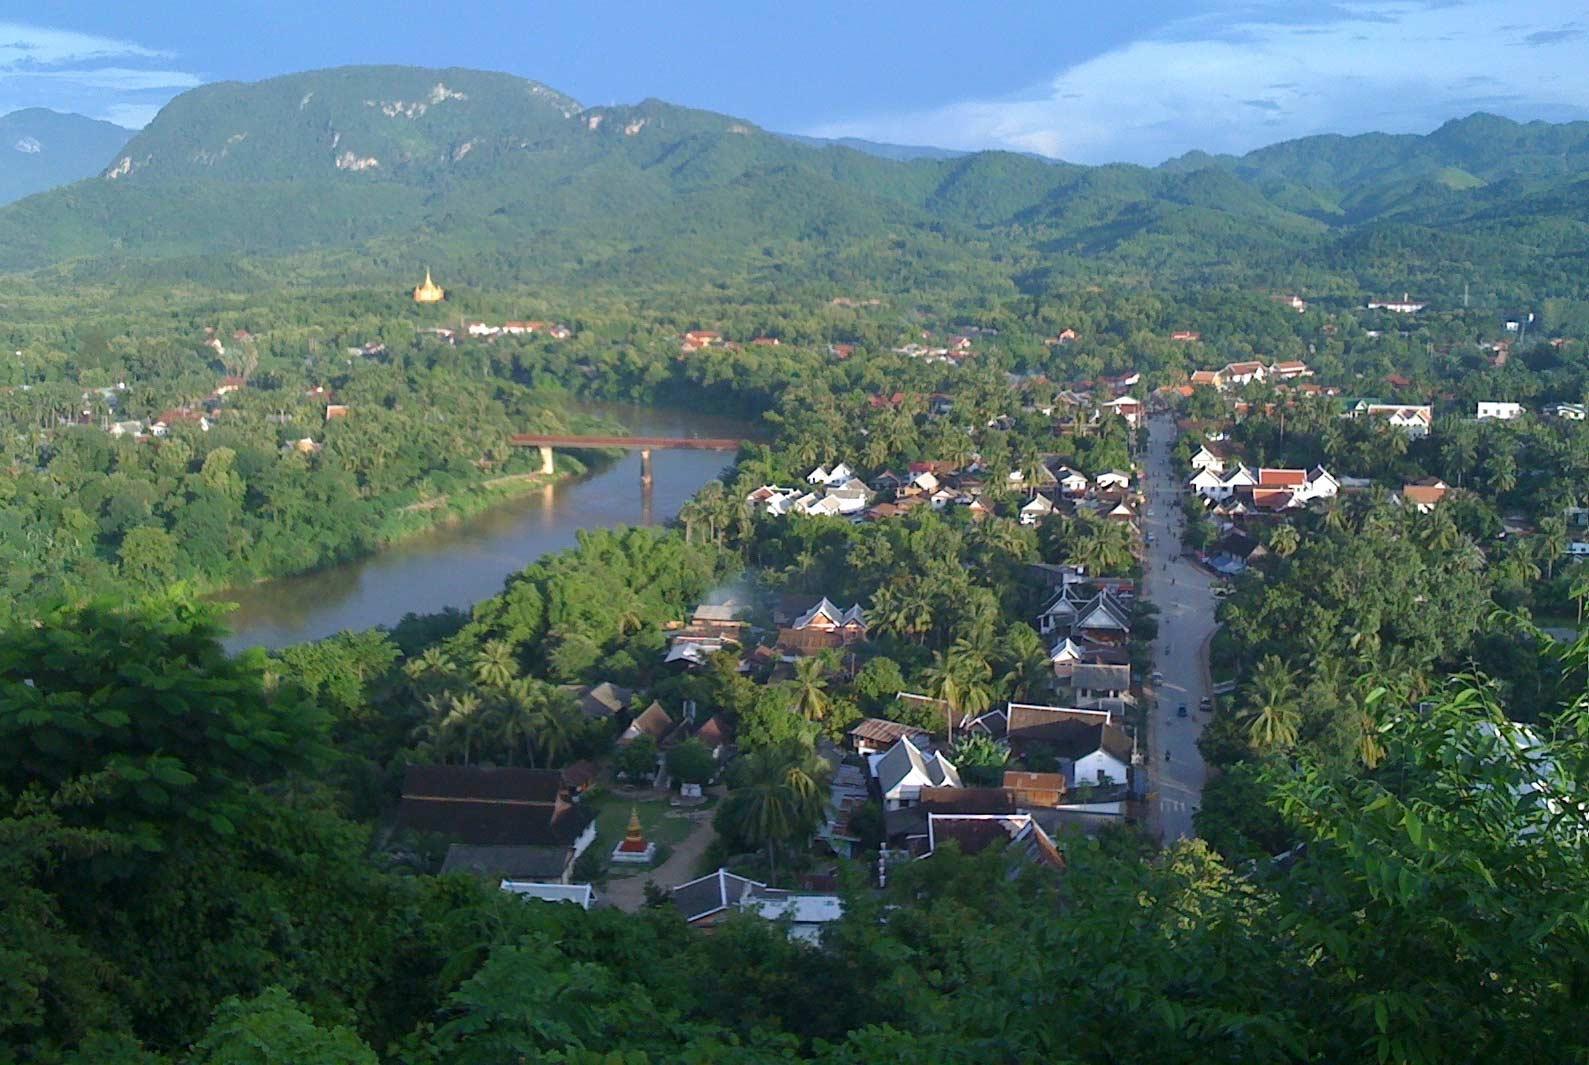 Laos City